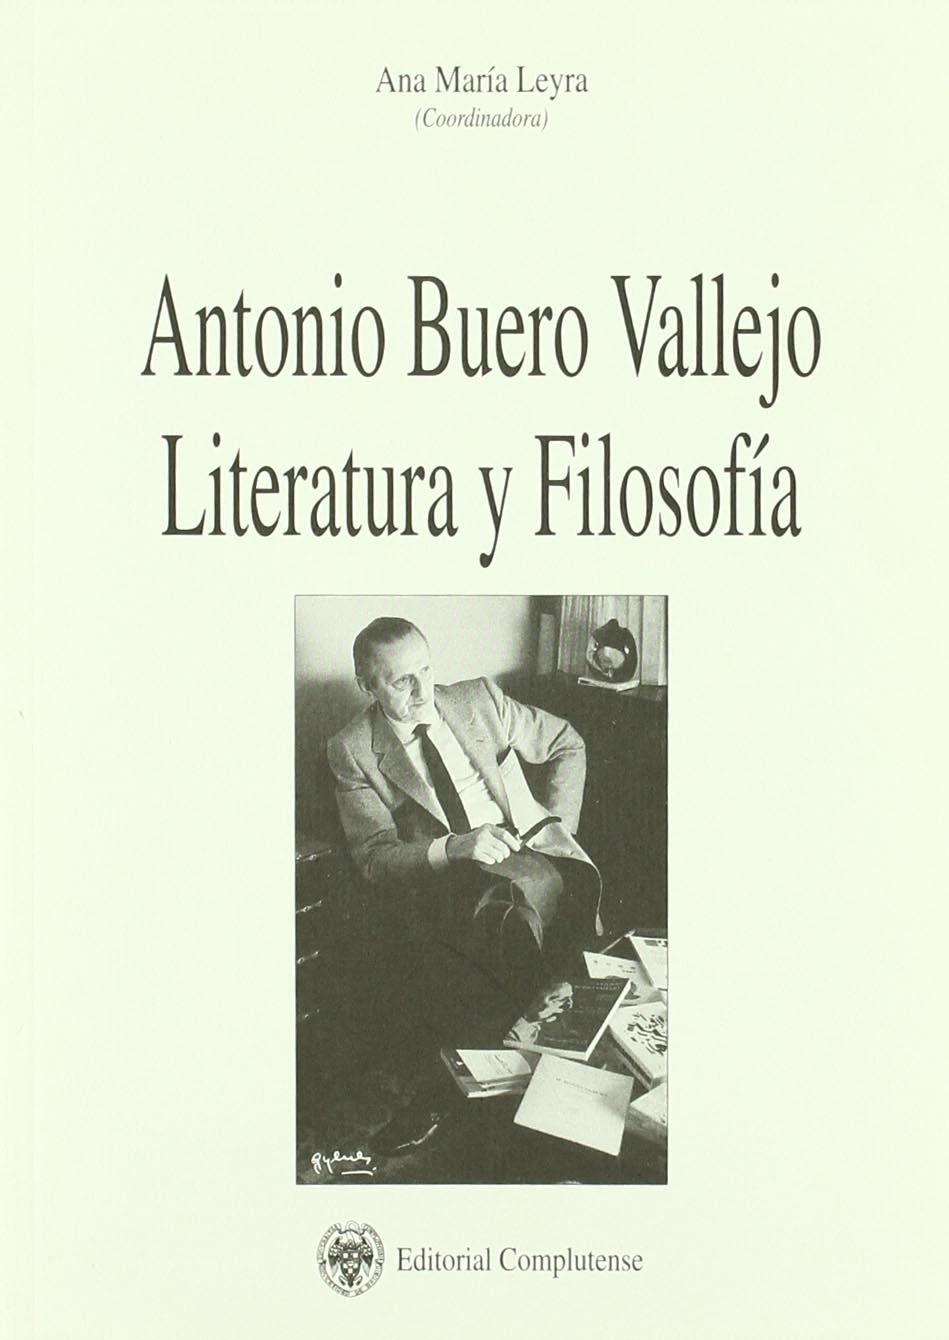 Download Antonio Buero Vallejo: Literatura Y Filosofia / Literature and Philosophy (Philosophica Complutensia) (Spanish Edition) PDF